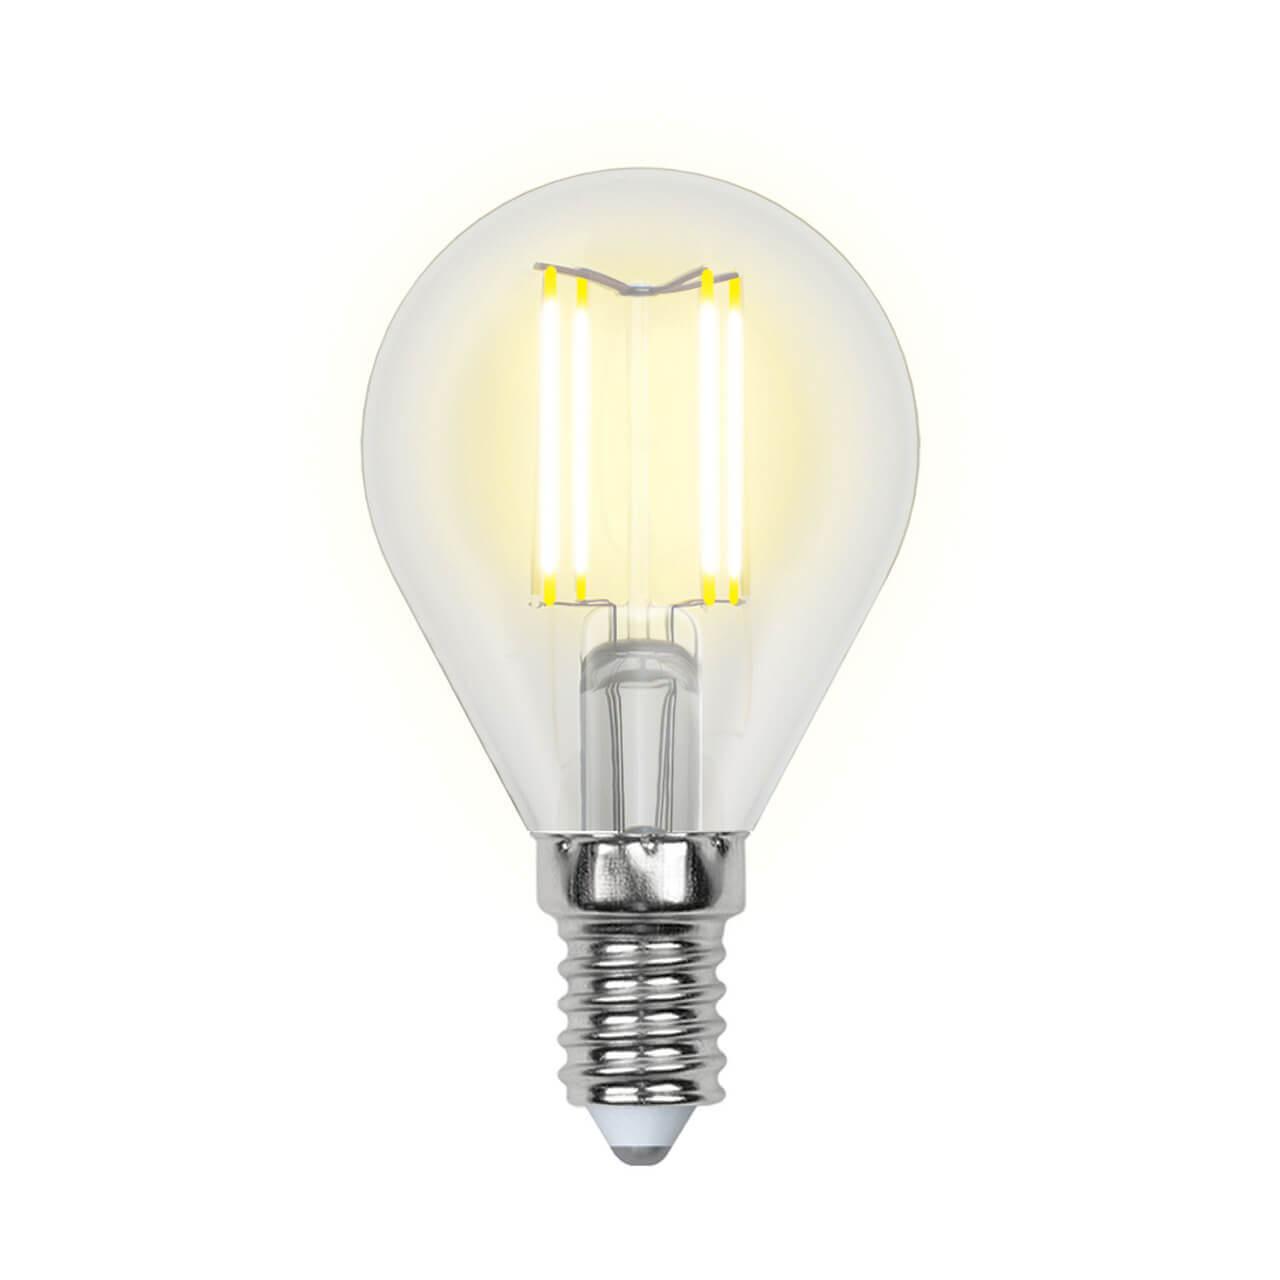 Фото - Лампочка Uniel LED-G45-6W/NW/E14/CL PLS02WH SKY Globe лампочка uniel led g45 13w 3000k e27 cl pls02wh sky